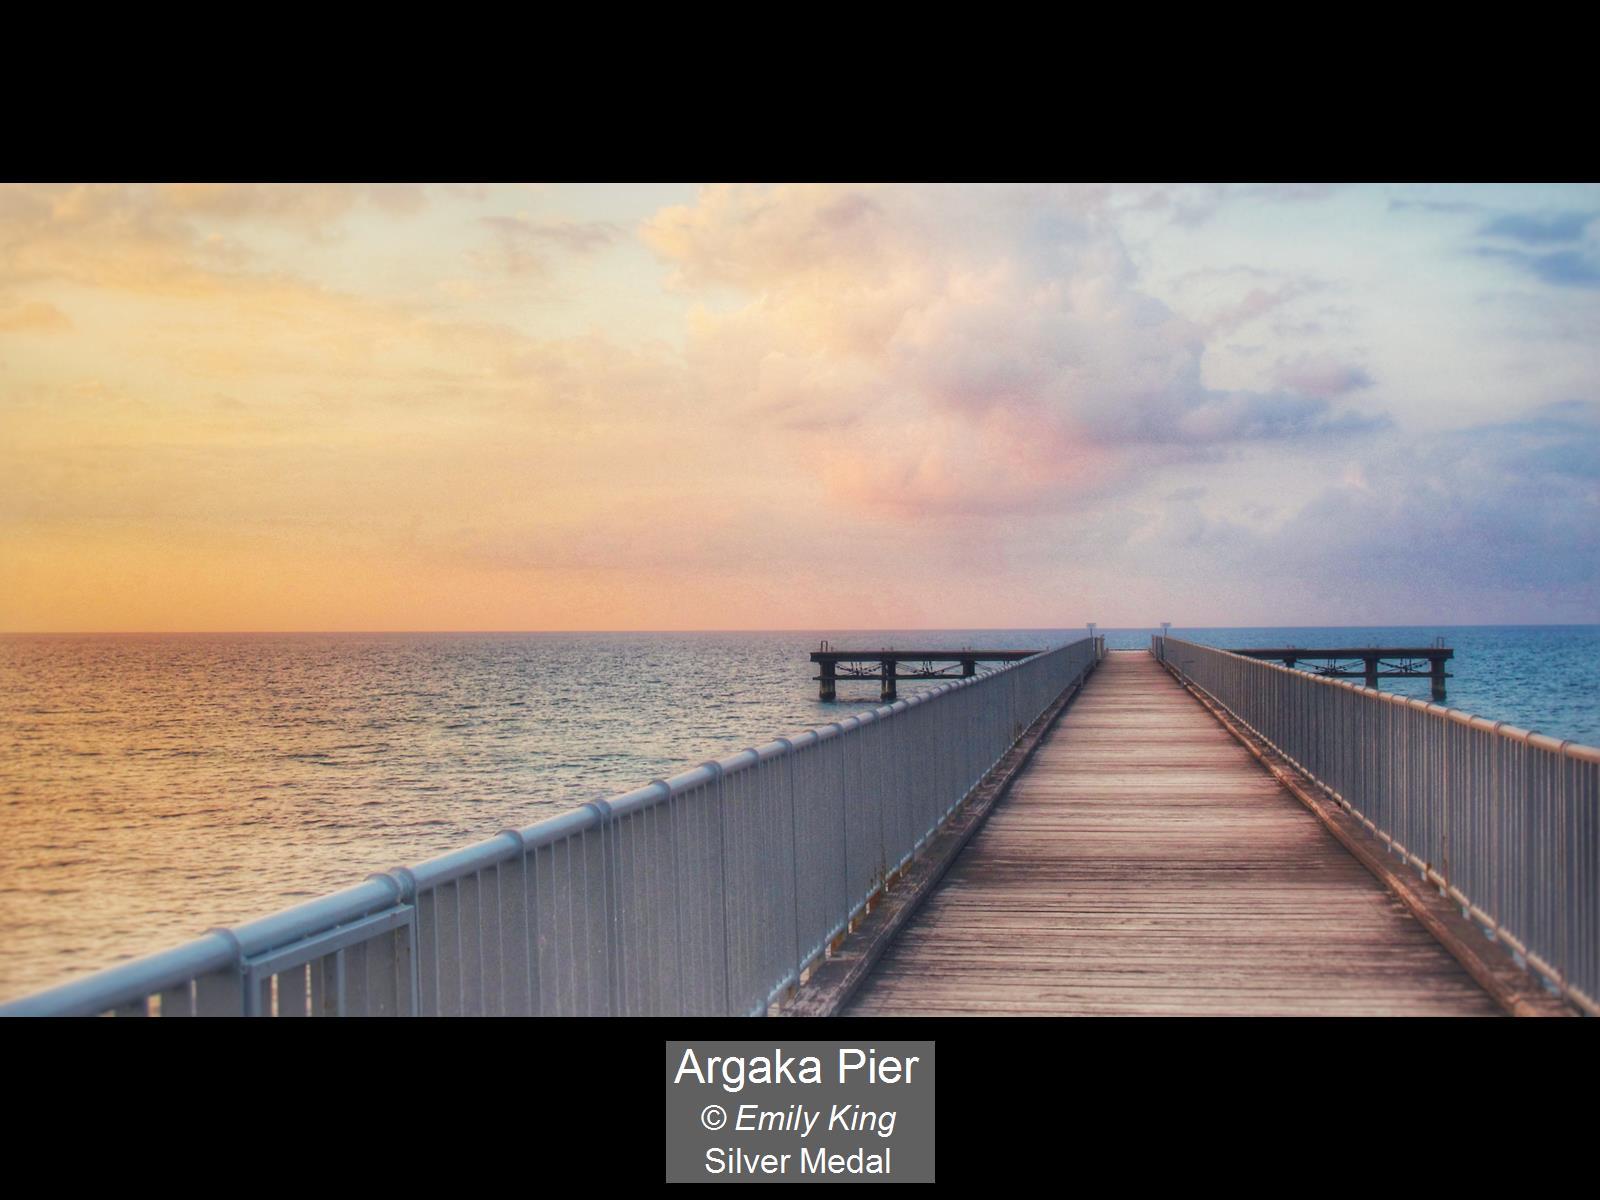 Argaka Pier_Emily King_Silver